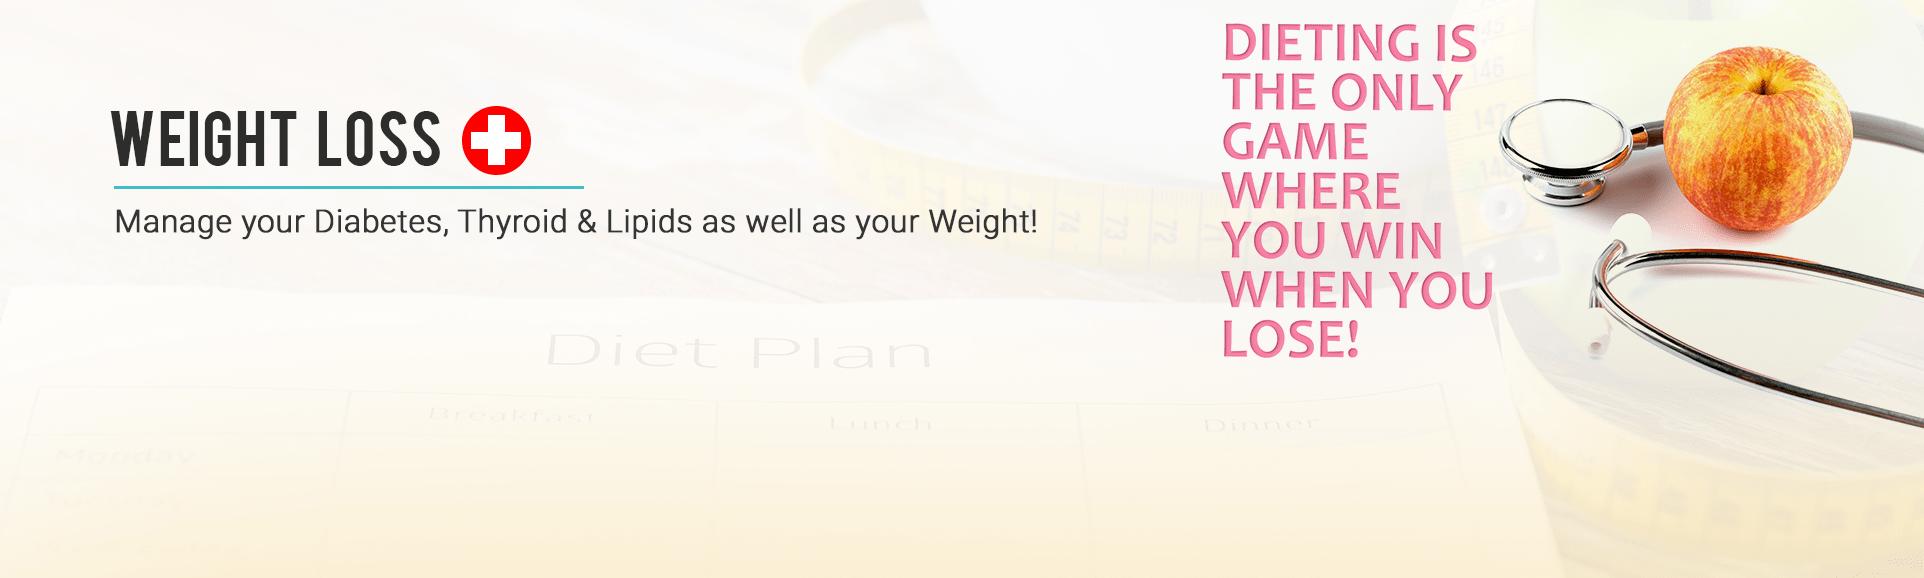 WEIGHT LOSS +  banner